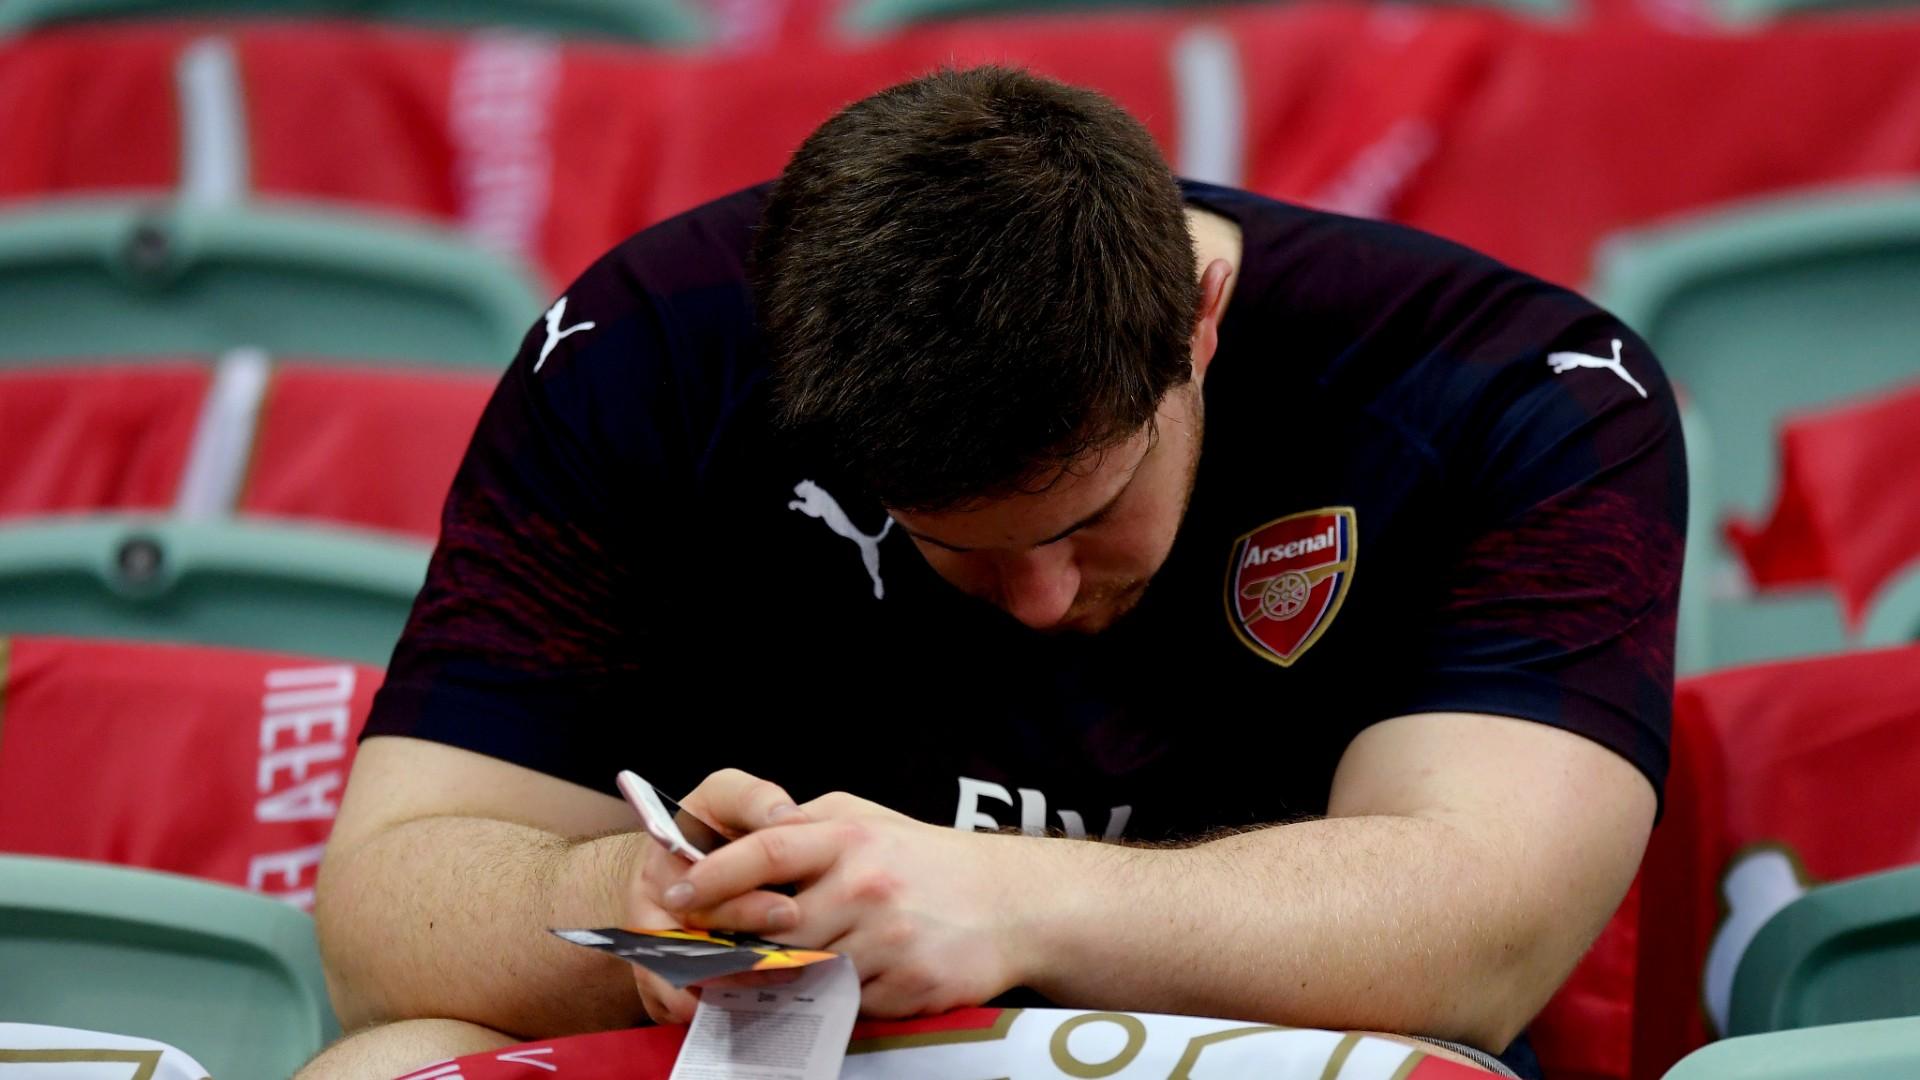 An unhappy Arsenal fan